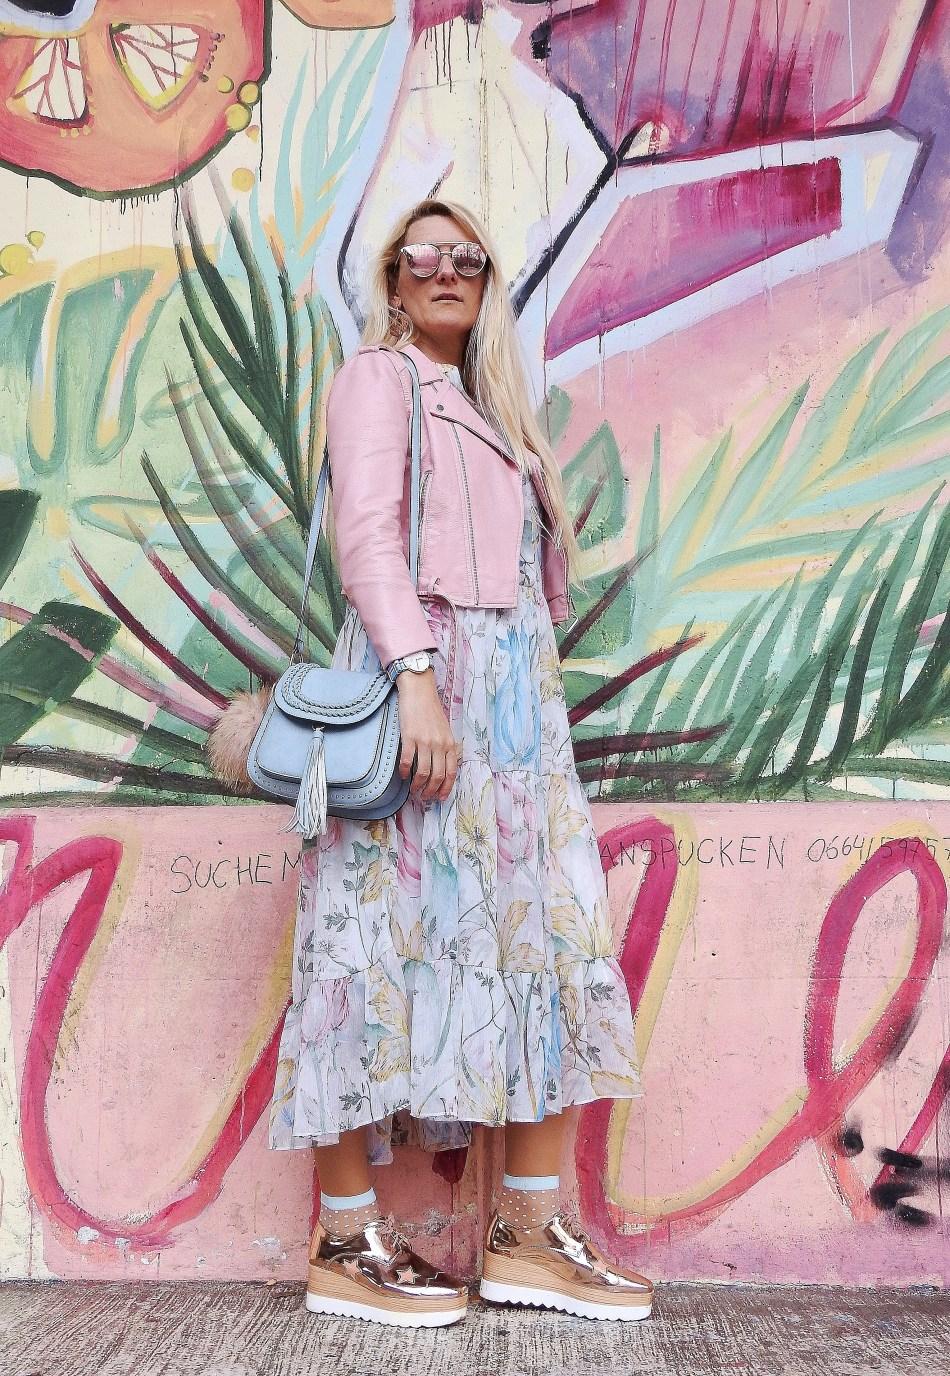 Fashionsocks-Floralprint-Maxidress-Springvibes-Springlook-Leatherjacket-pink-Daniel-Wellington-Watch-Chloe-Bag-carrieslifestyle-Tamara-Prutsch-H&M-Stella-Mccartney-Platforms